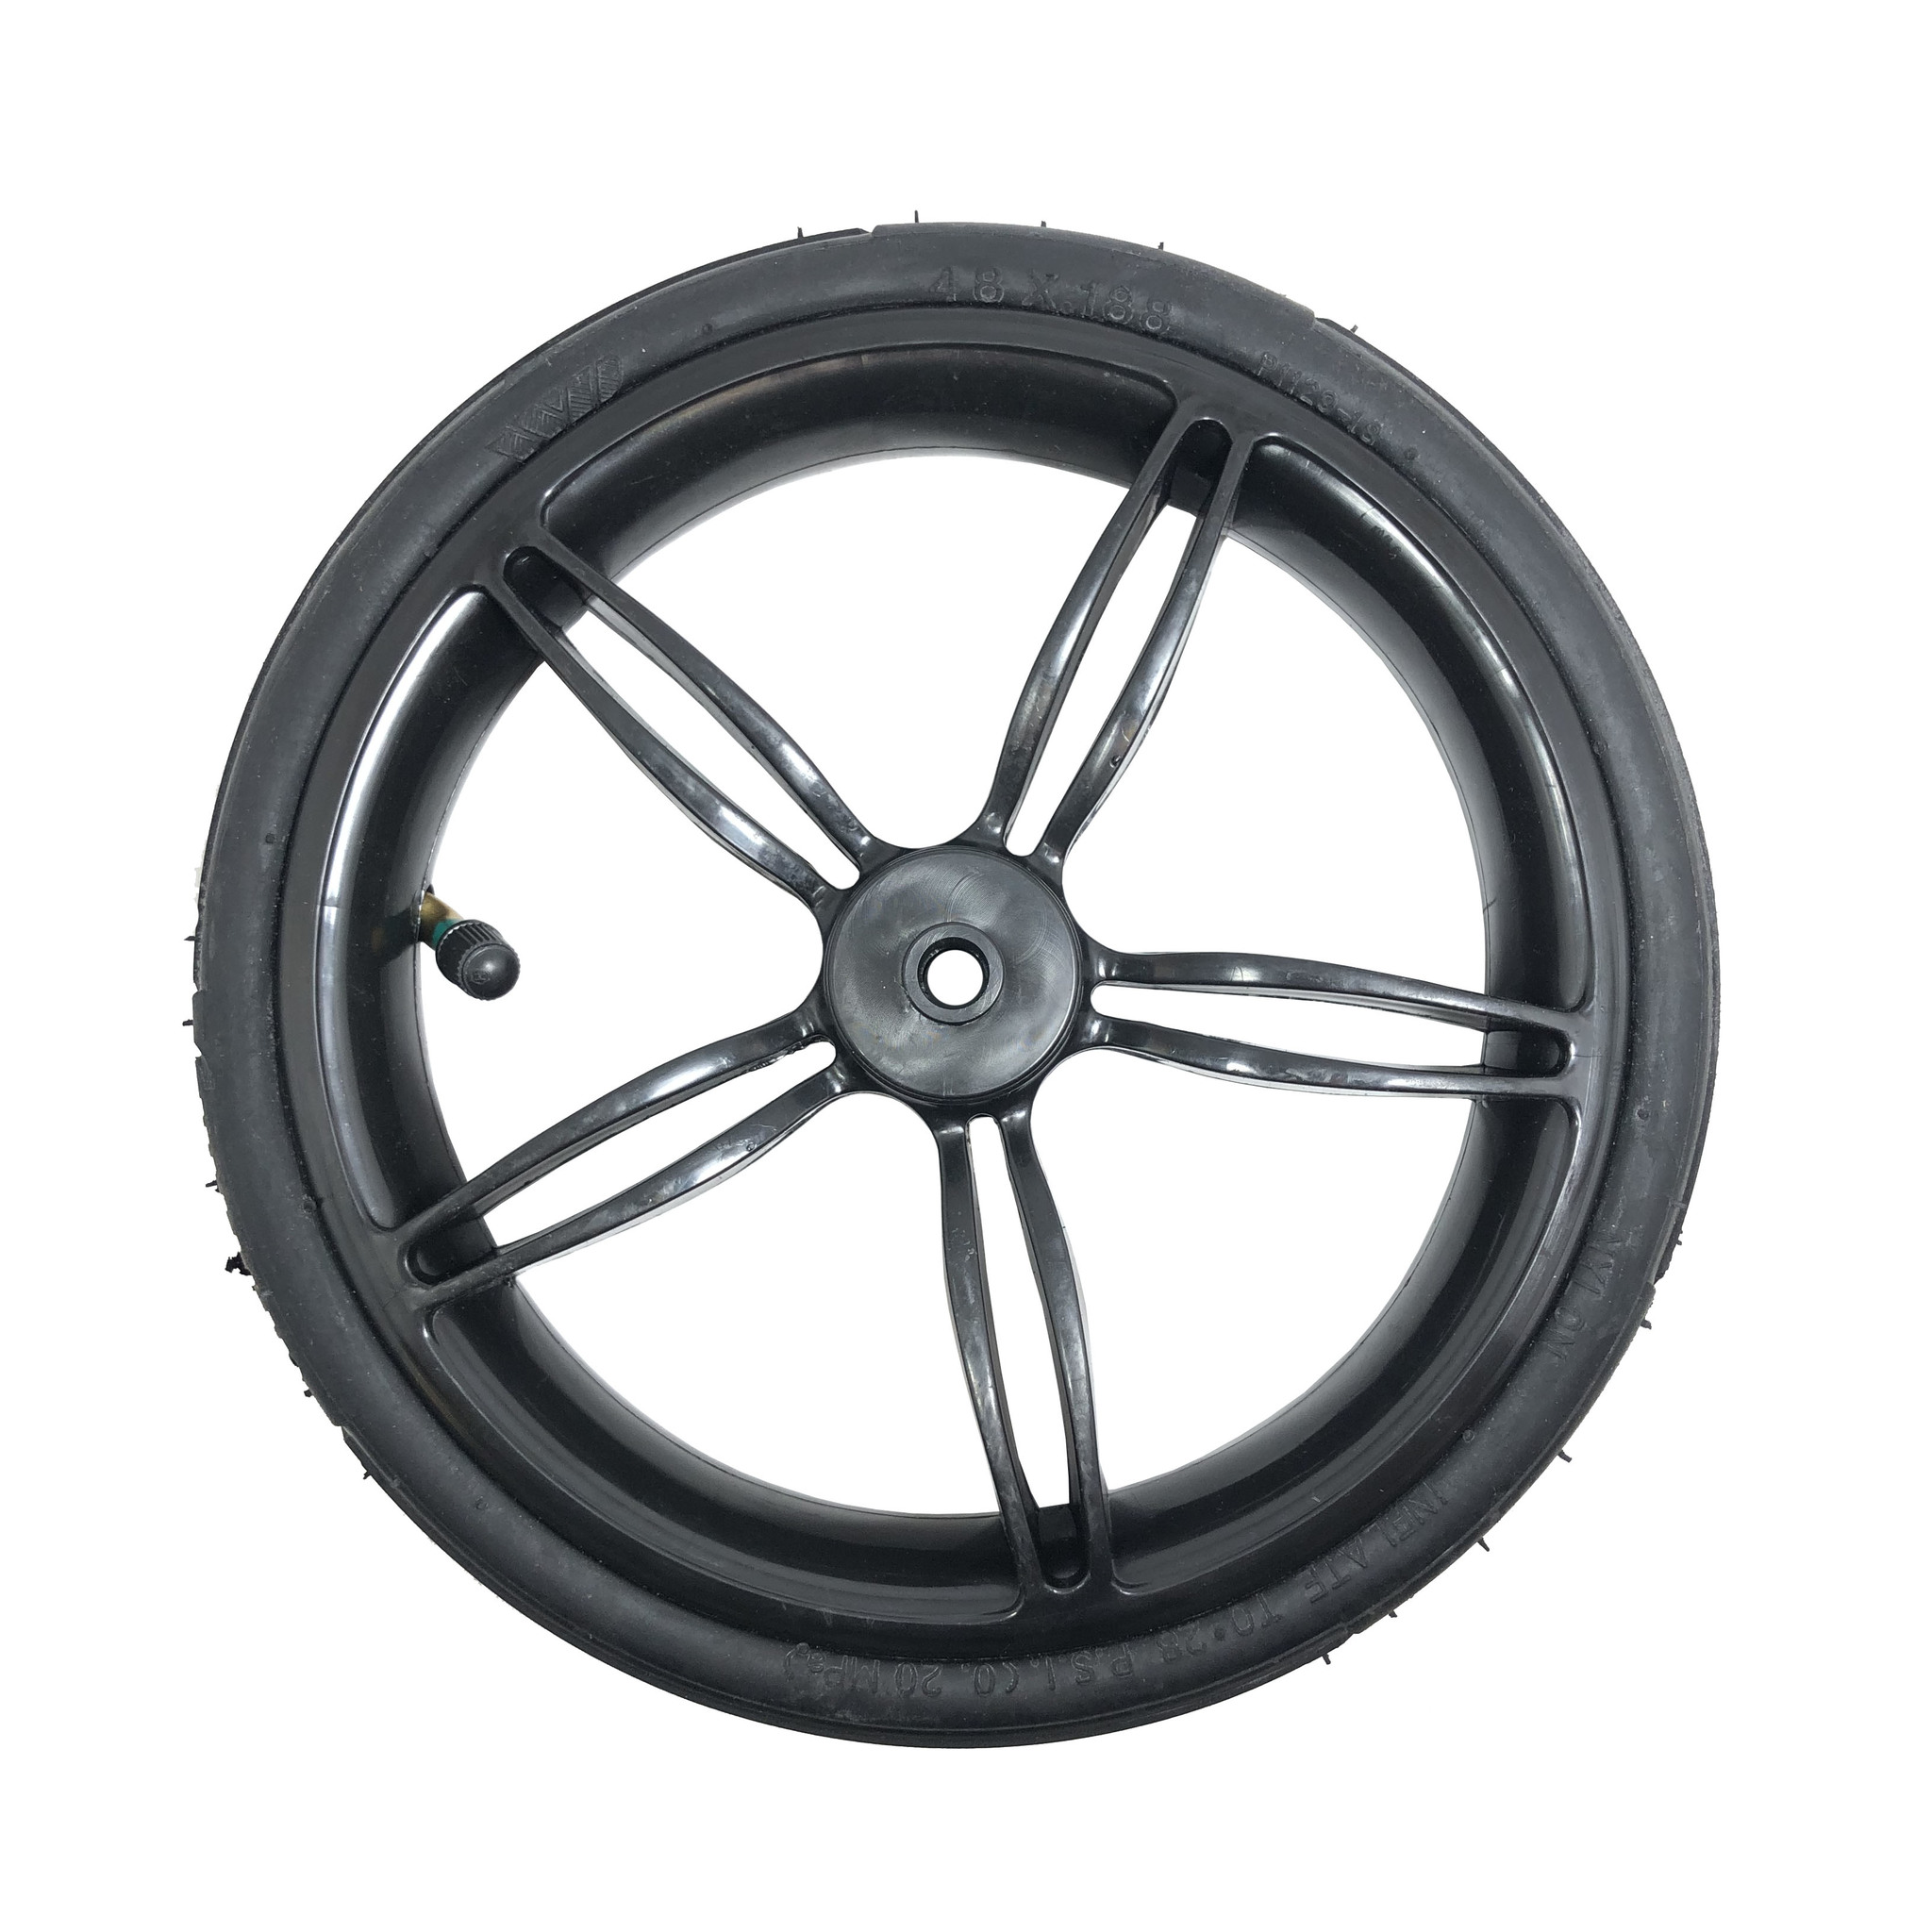 Колеса для детских колясок Колесо 48x188 Speed|Drifting 48-188.jpg